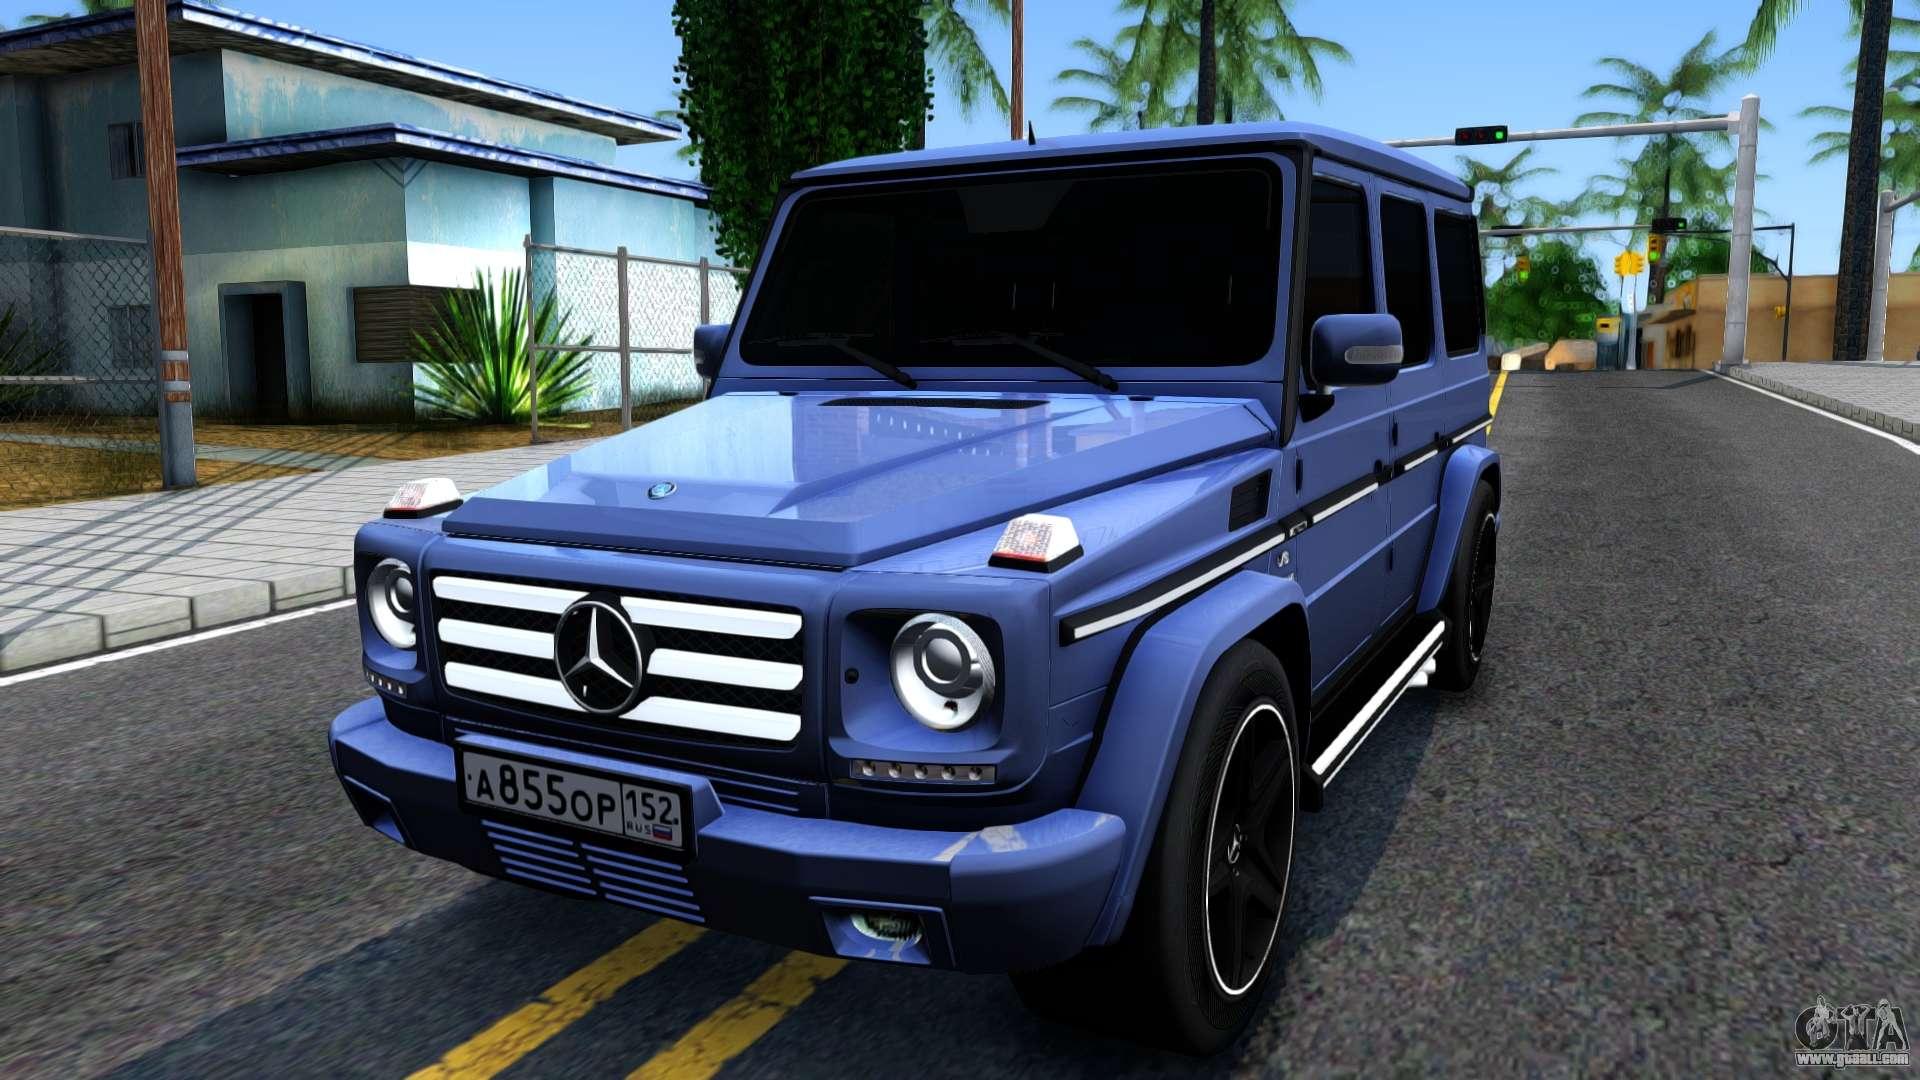 Mercedes Benz G55 Amg For Gta San Andreas